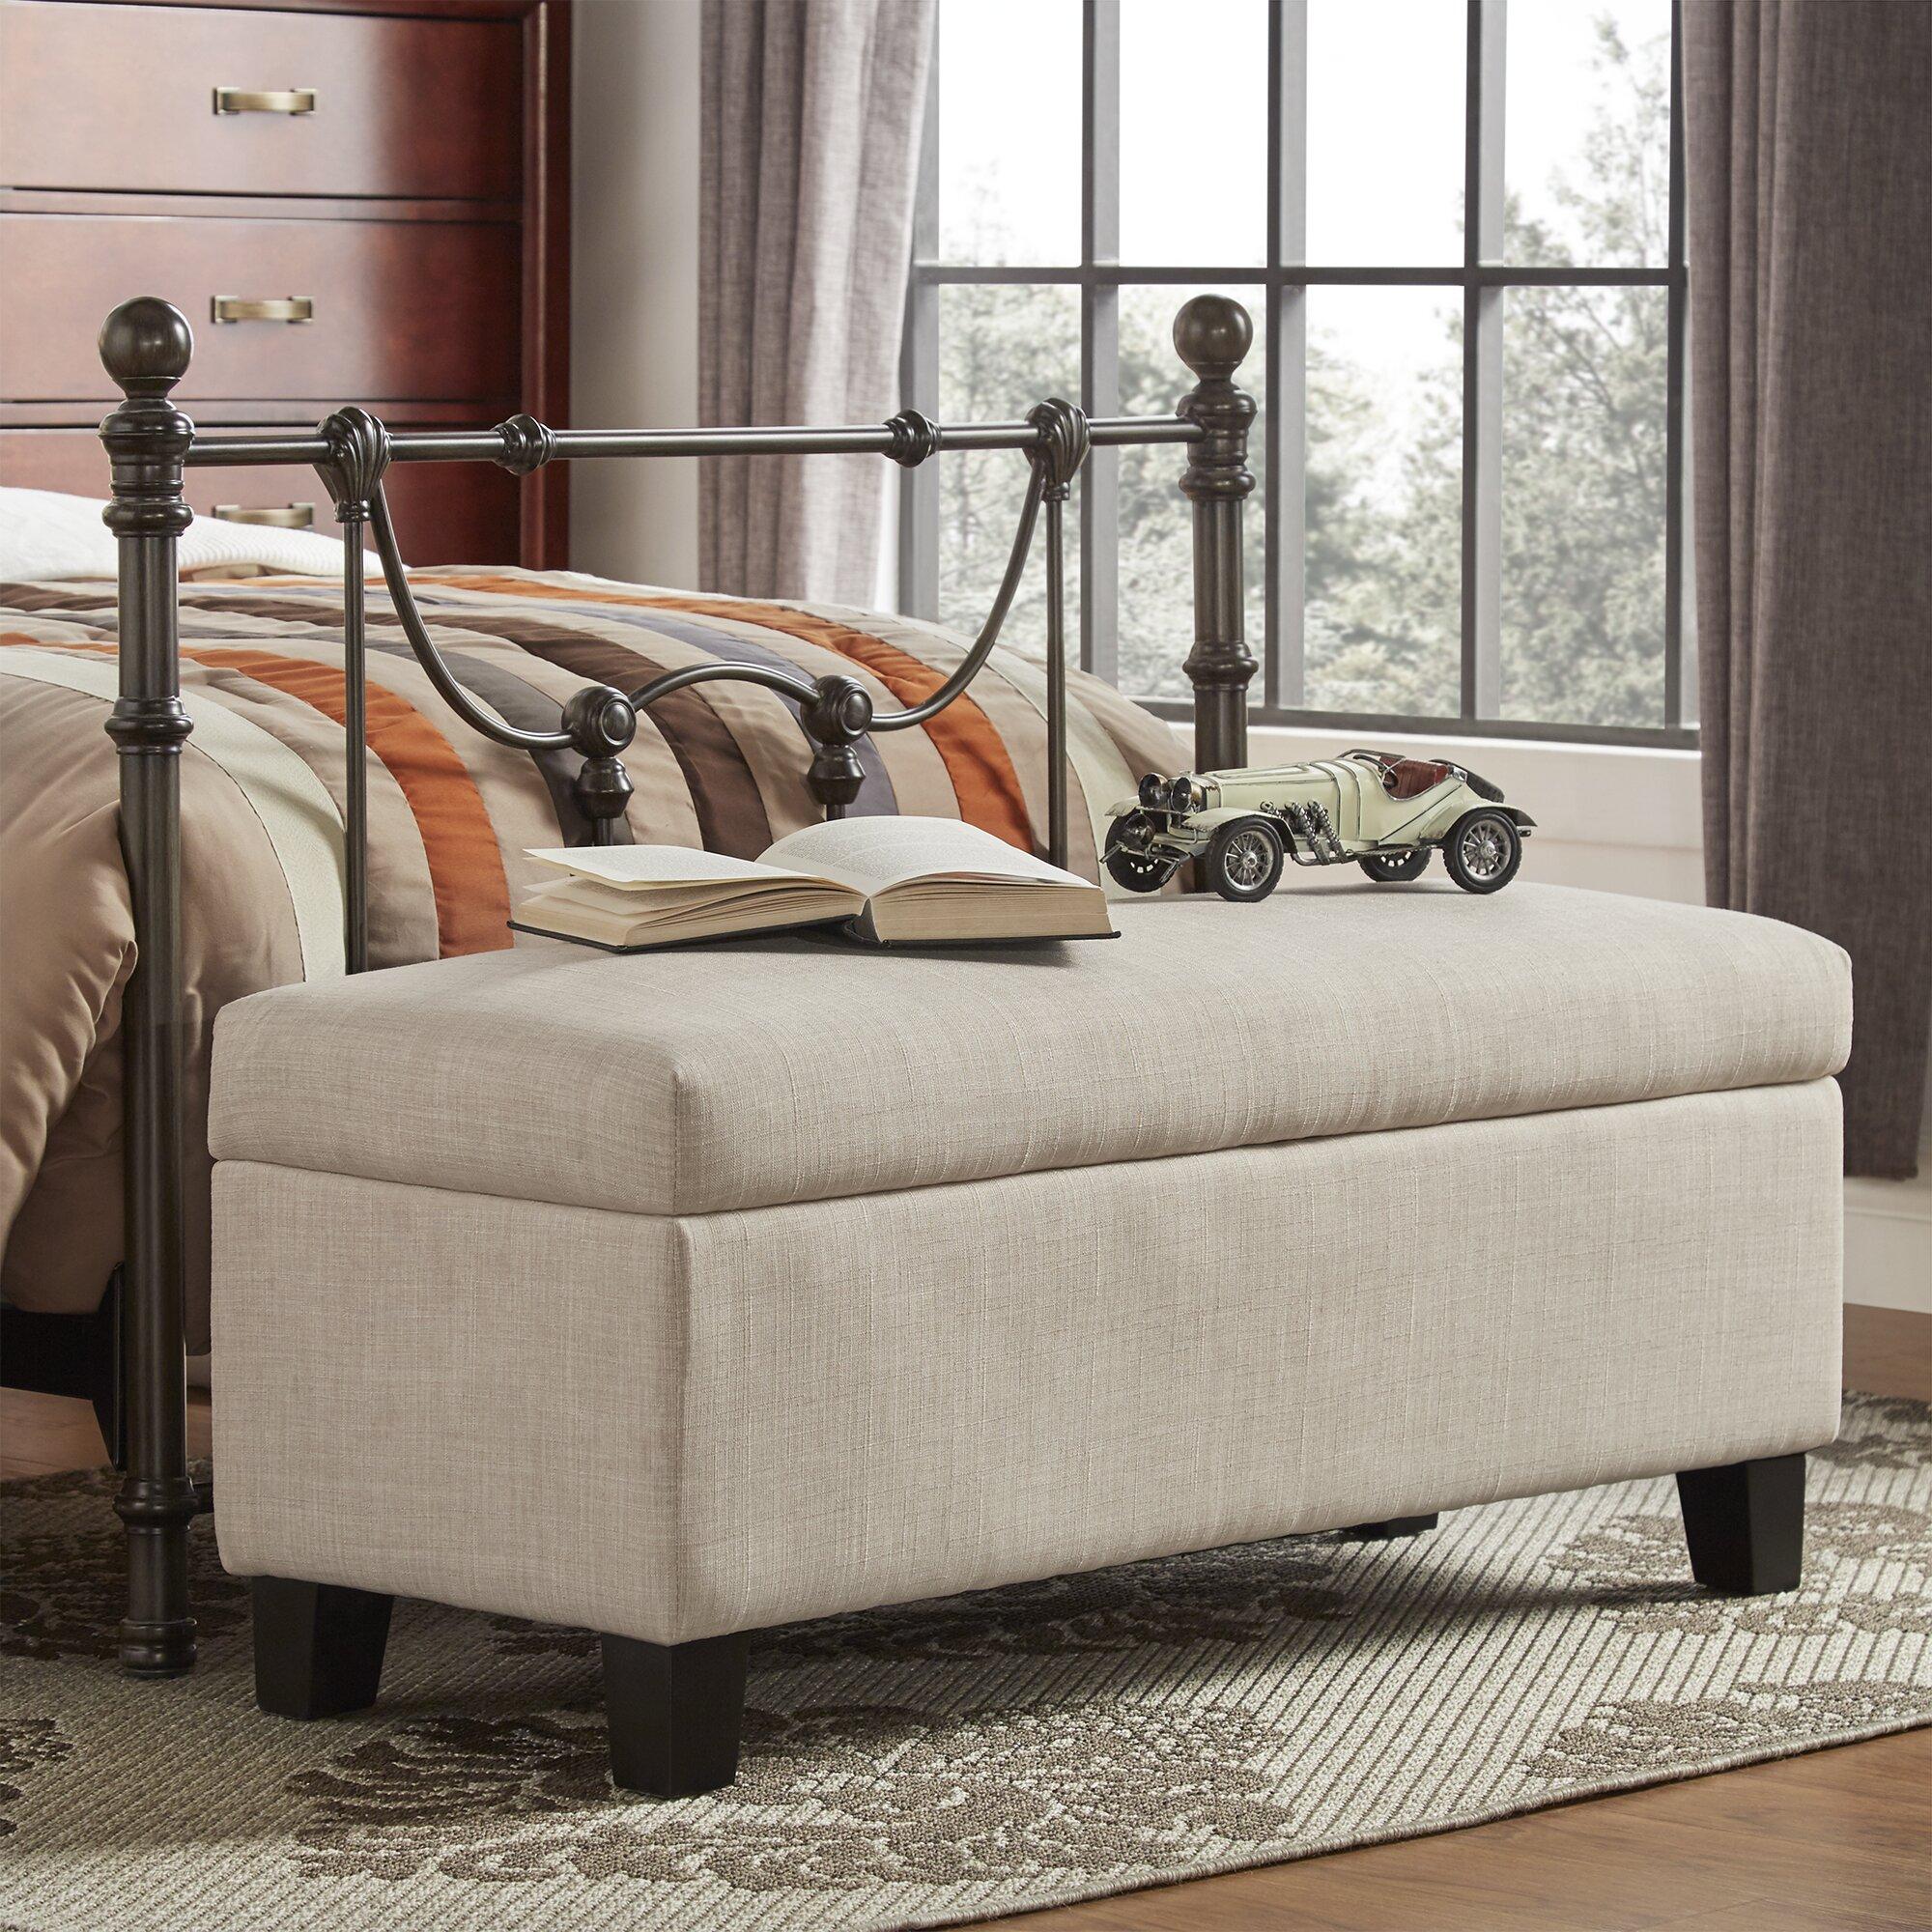 Kingstown home kendrick upholstered storage bedroom bench - Bedroom storage bench upholstered ...